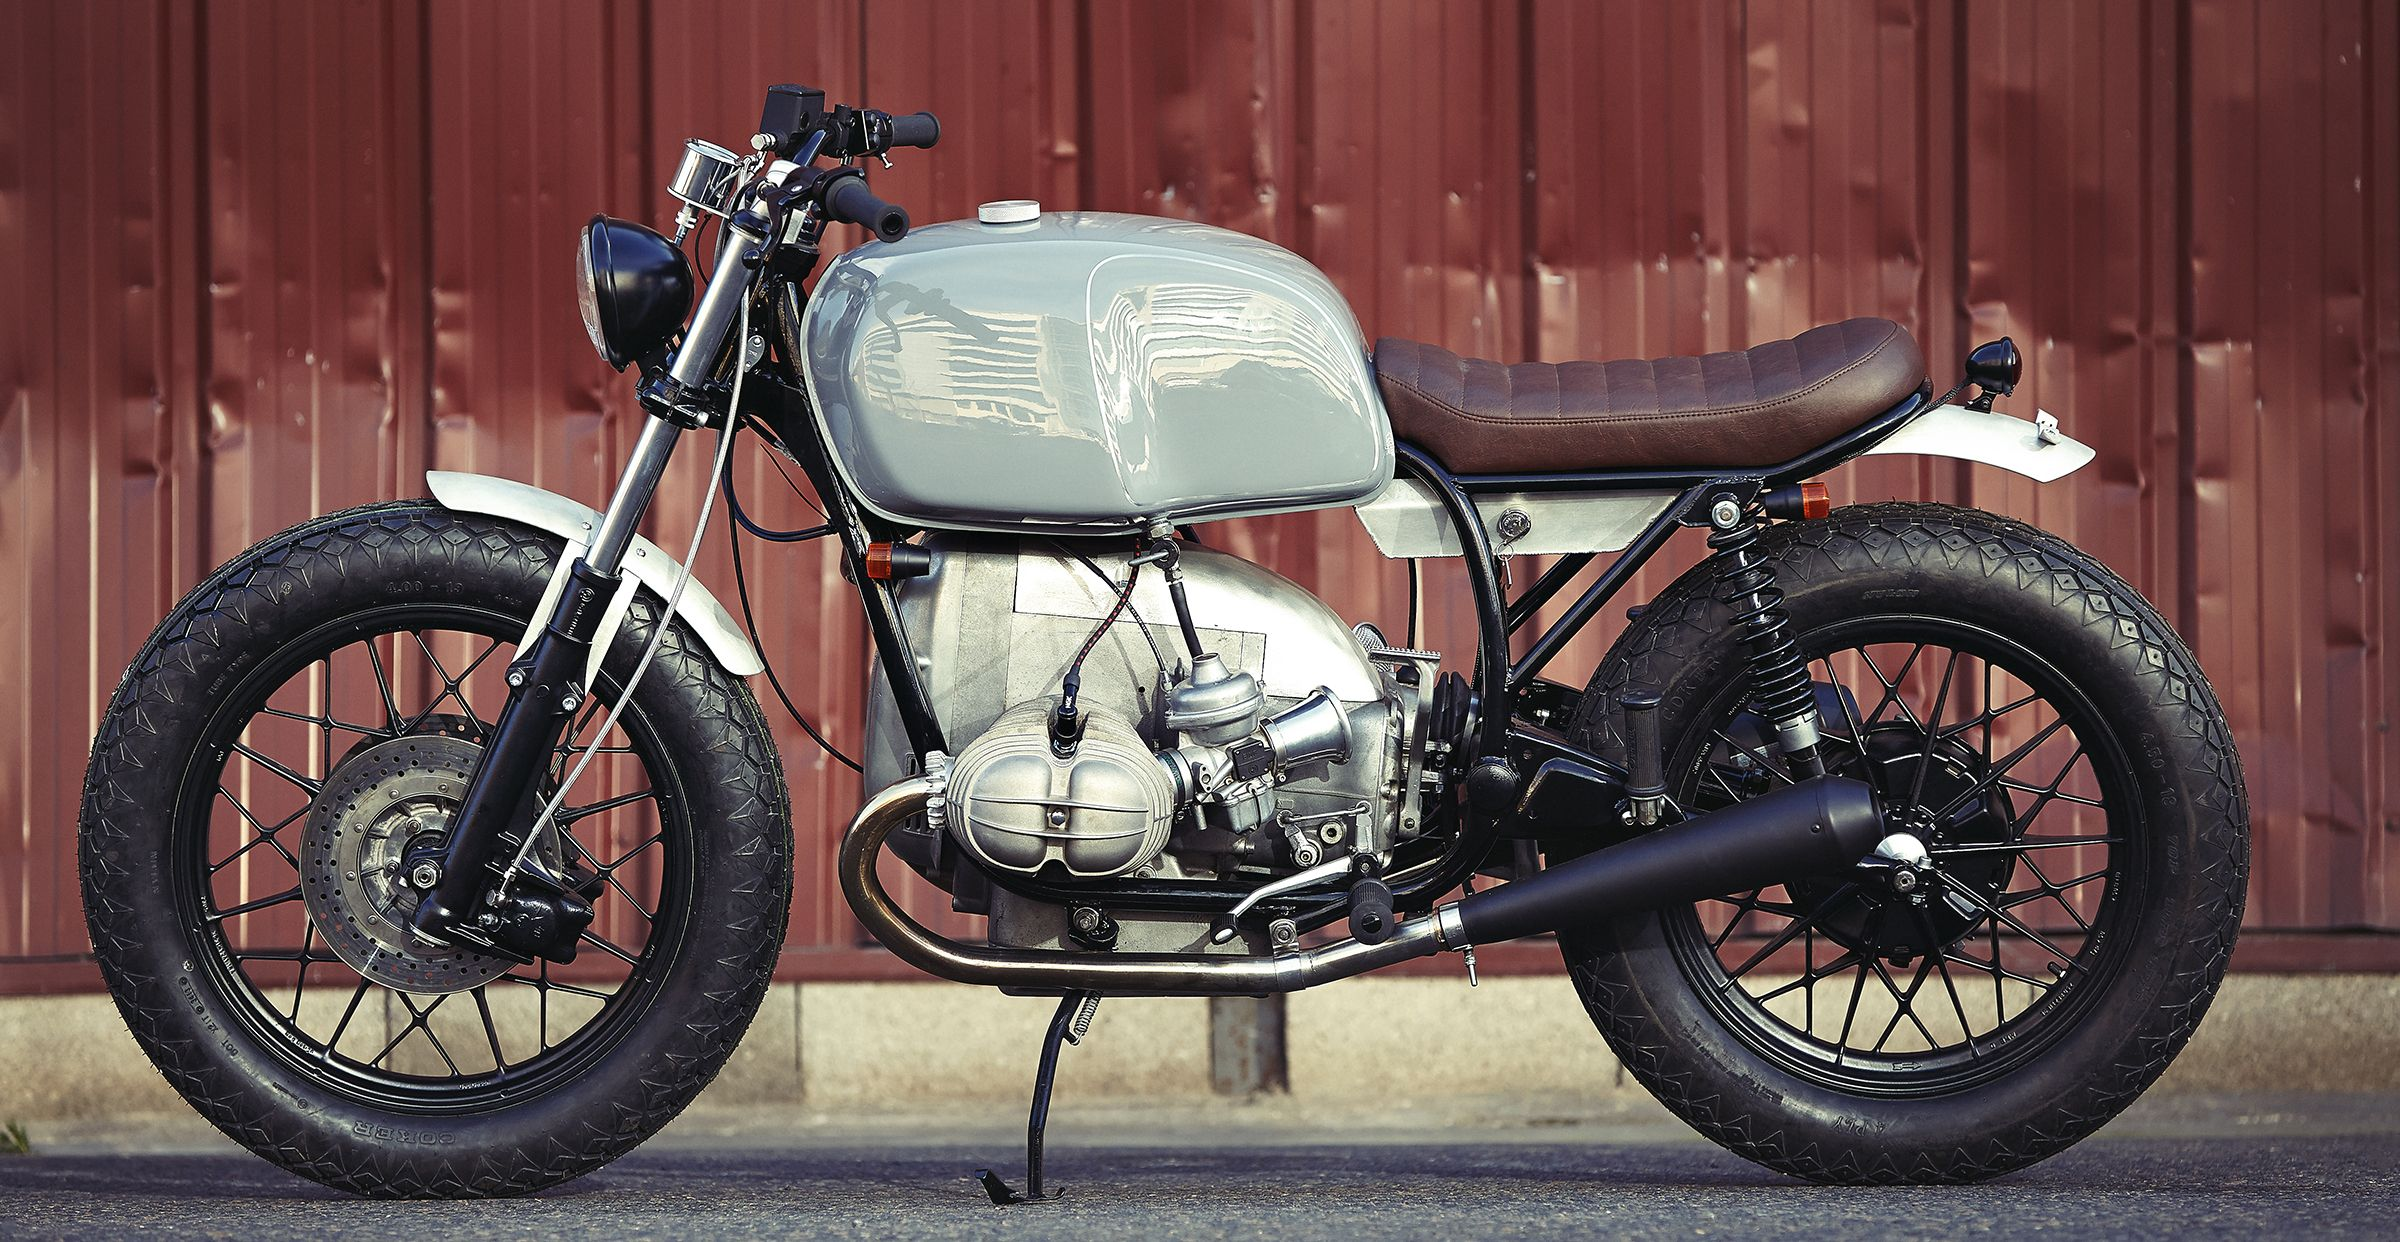 Bmw R100 Clutch Custom Motorcycles Bmw Ancienne Bmw Voitures Et Motos